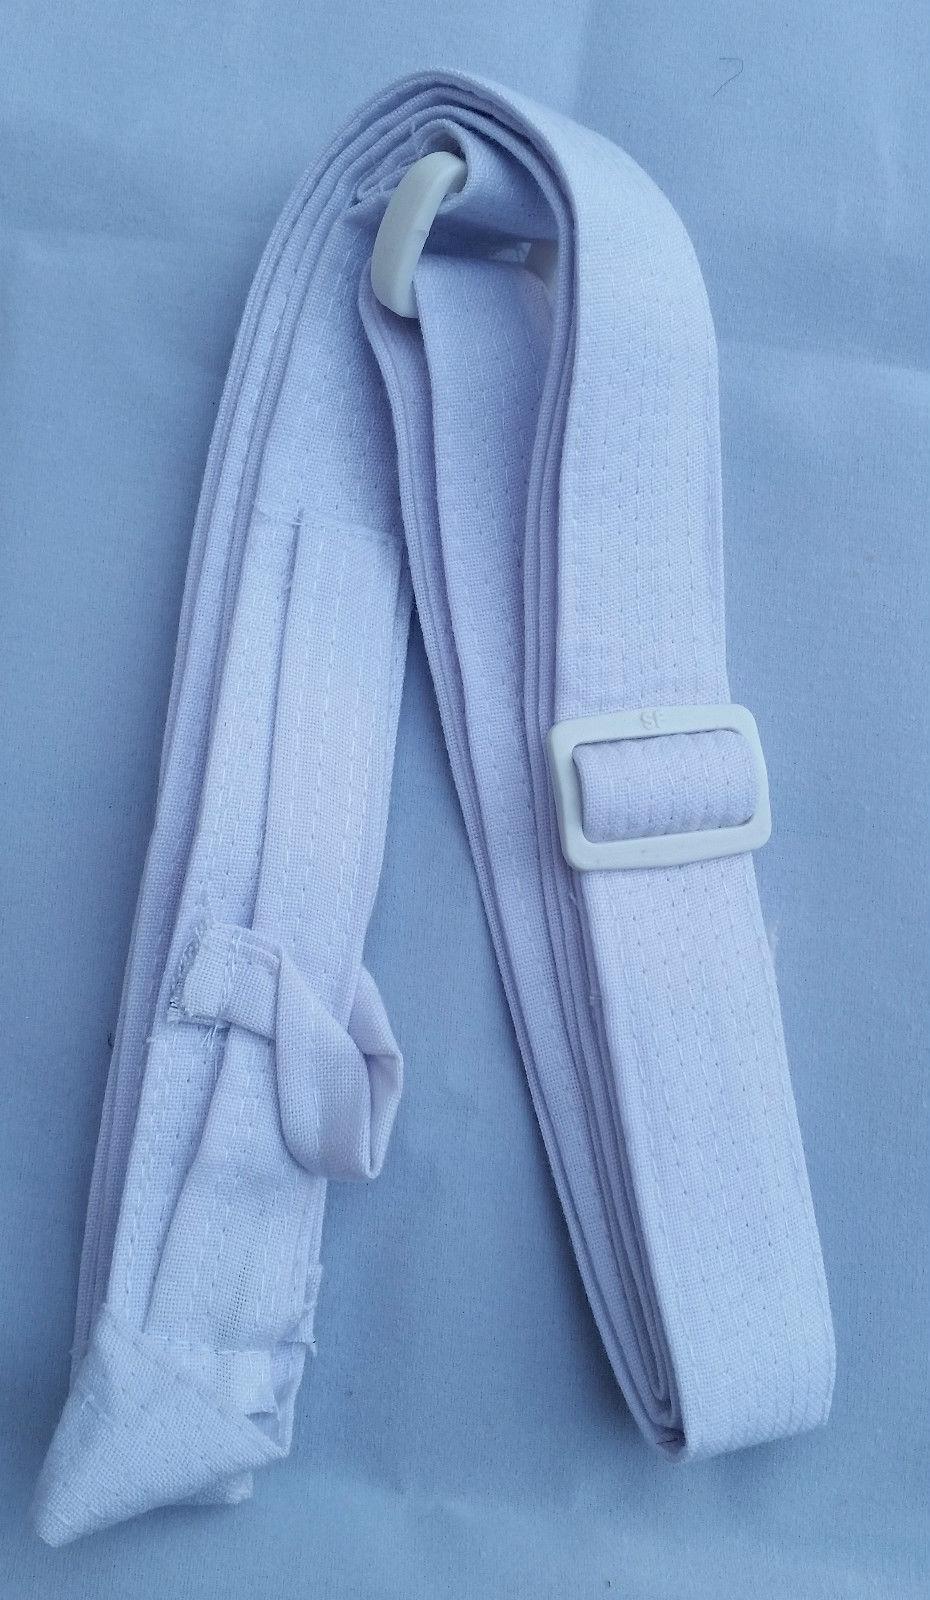 Sij Singh Khalsa Ajustable Gatra Cinturón para Siri Sahib/Kirpan varios colores